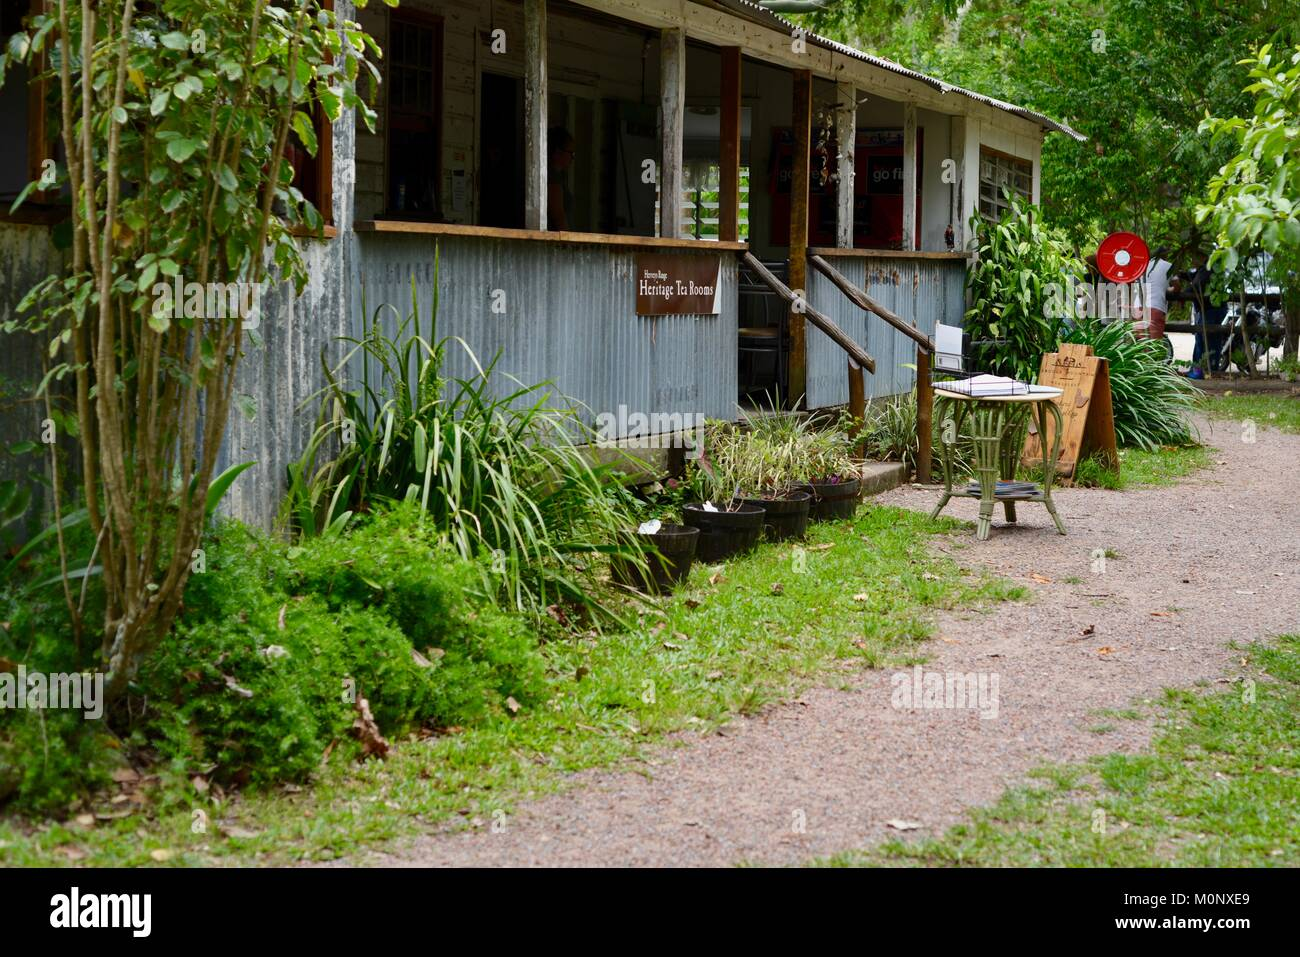 Herveys Range Heritage Tea Rooms, Thornton Gap Road, Hervey Range, Queensland, Australia - Stock Image